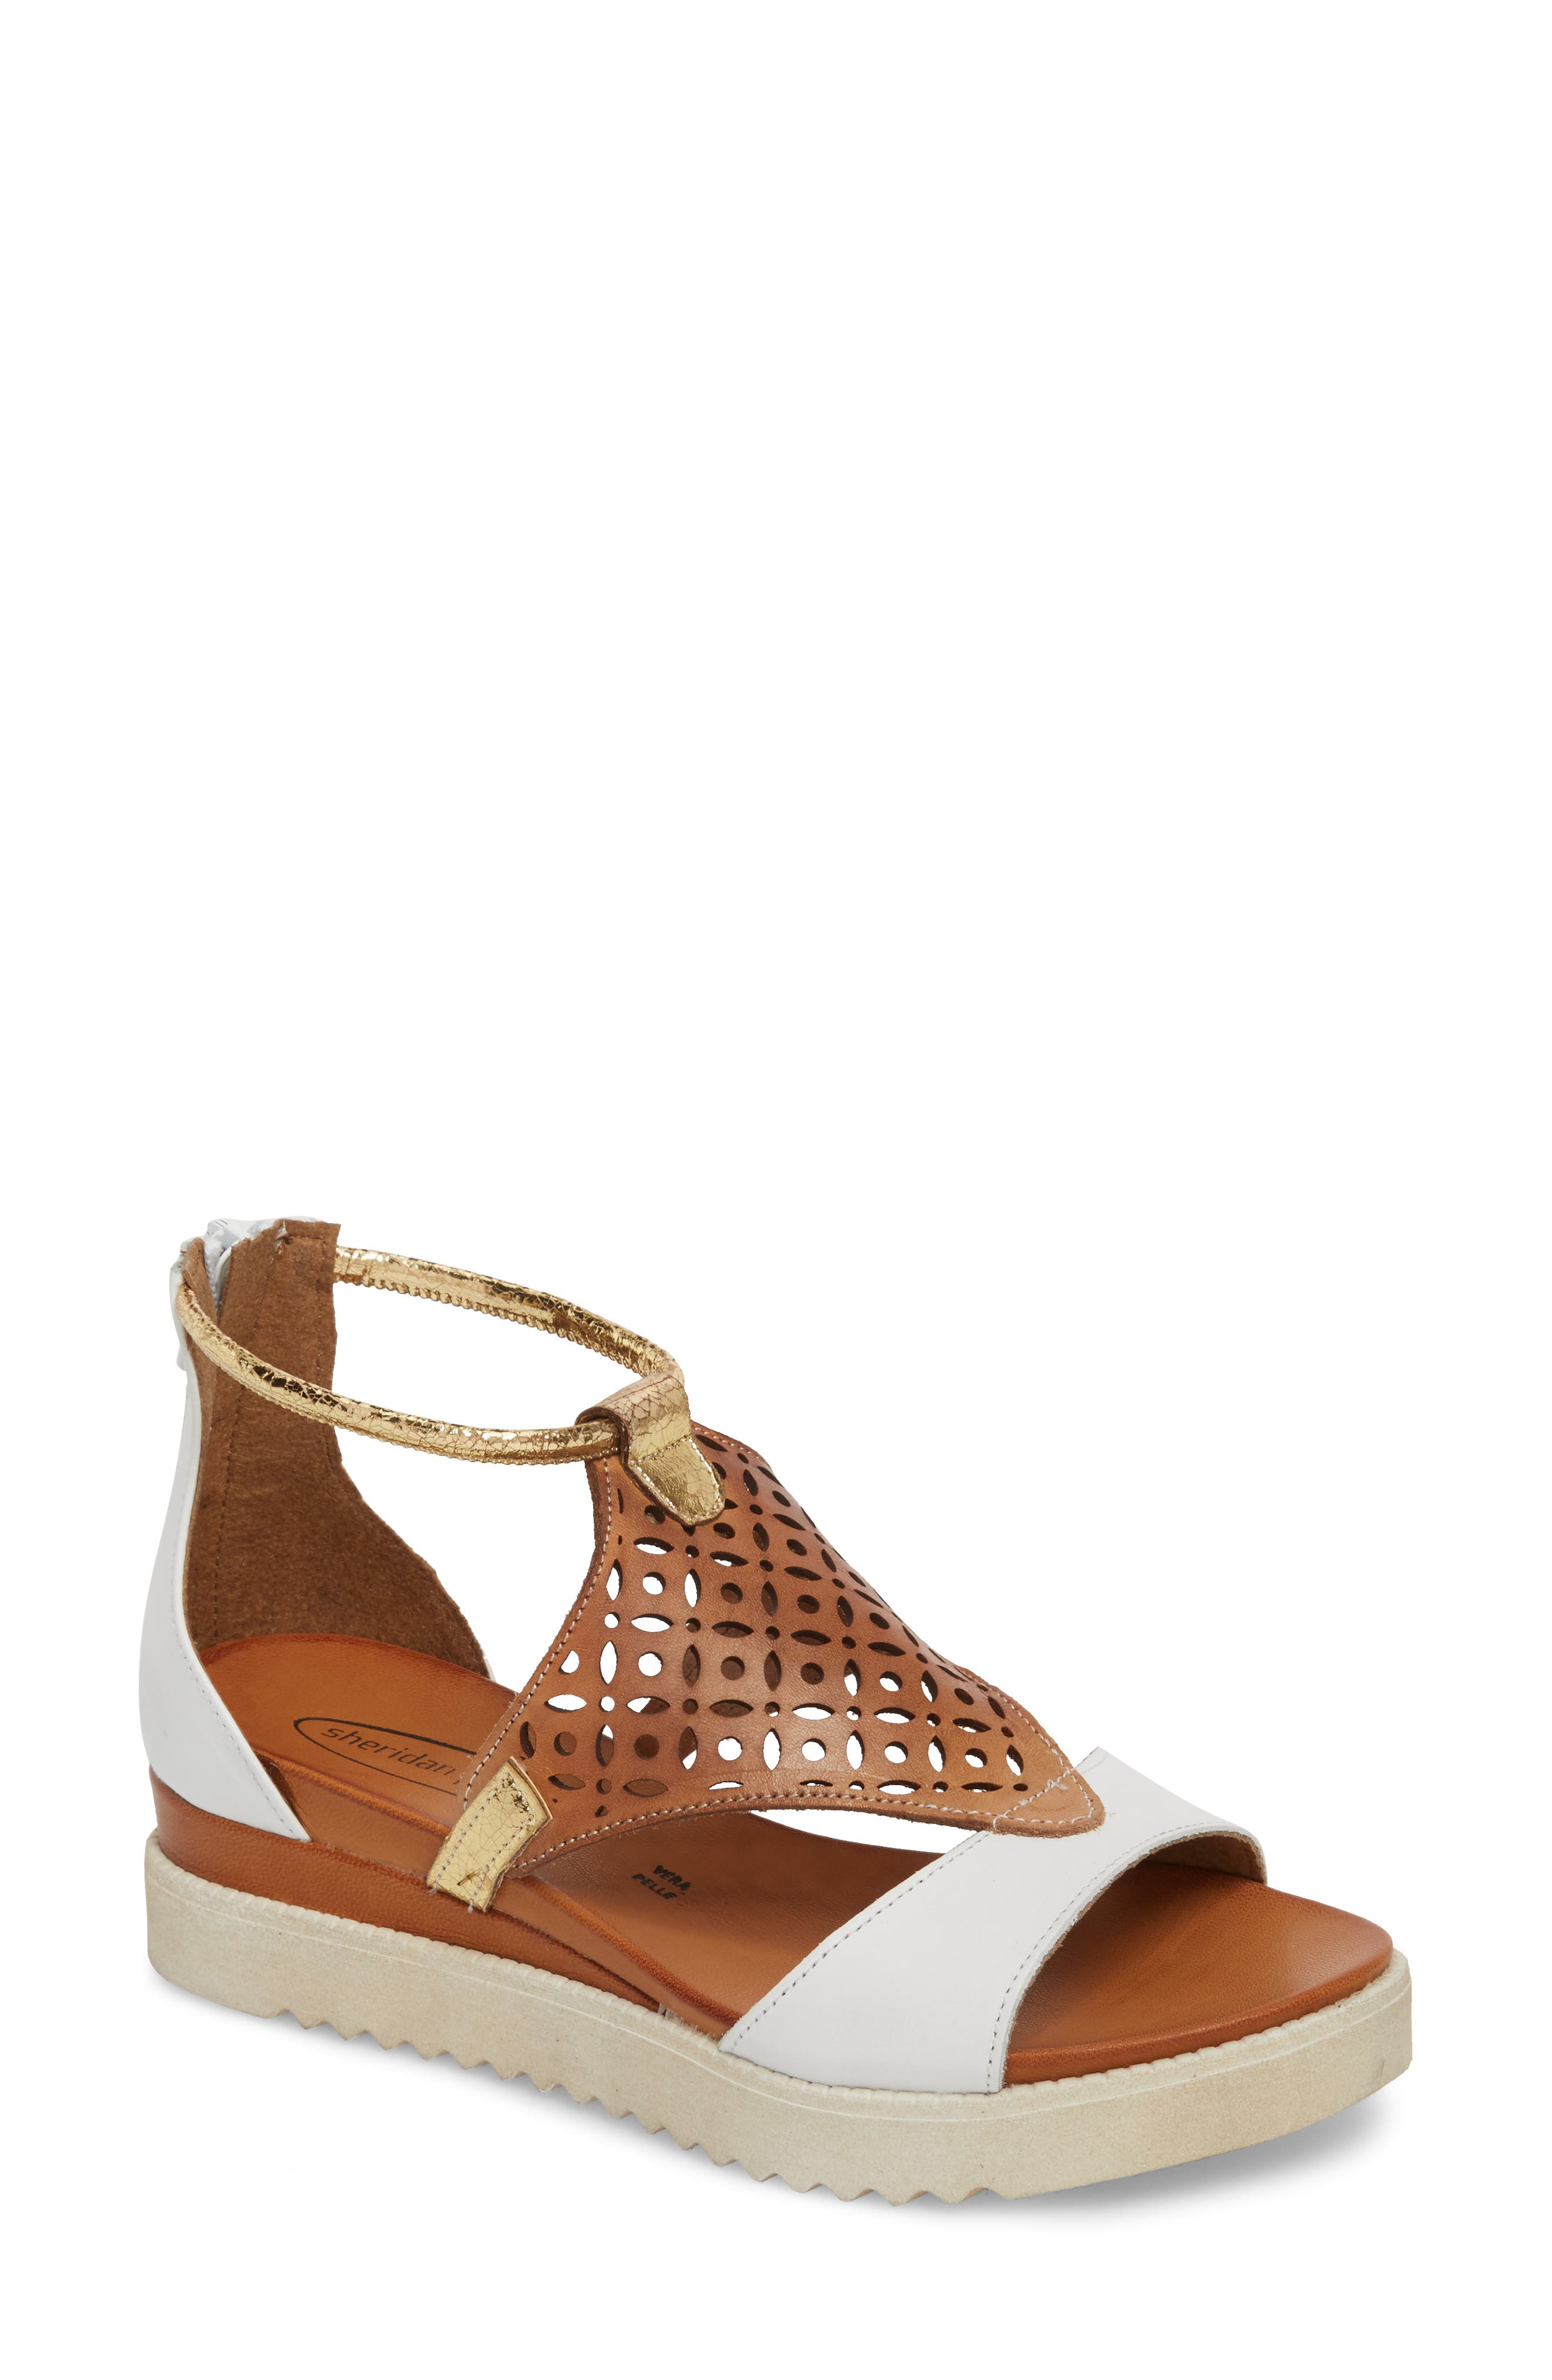 Blaze Sandal,                             Main thumbnail 1, color,                             White Combo Leather